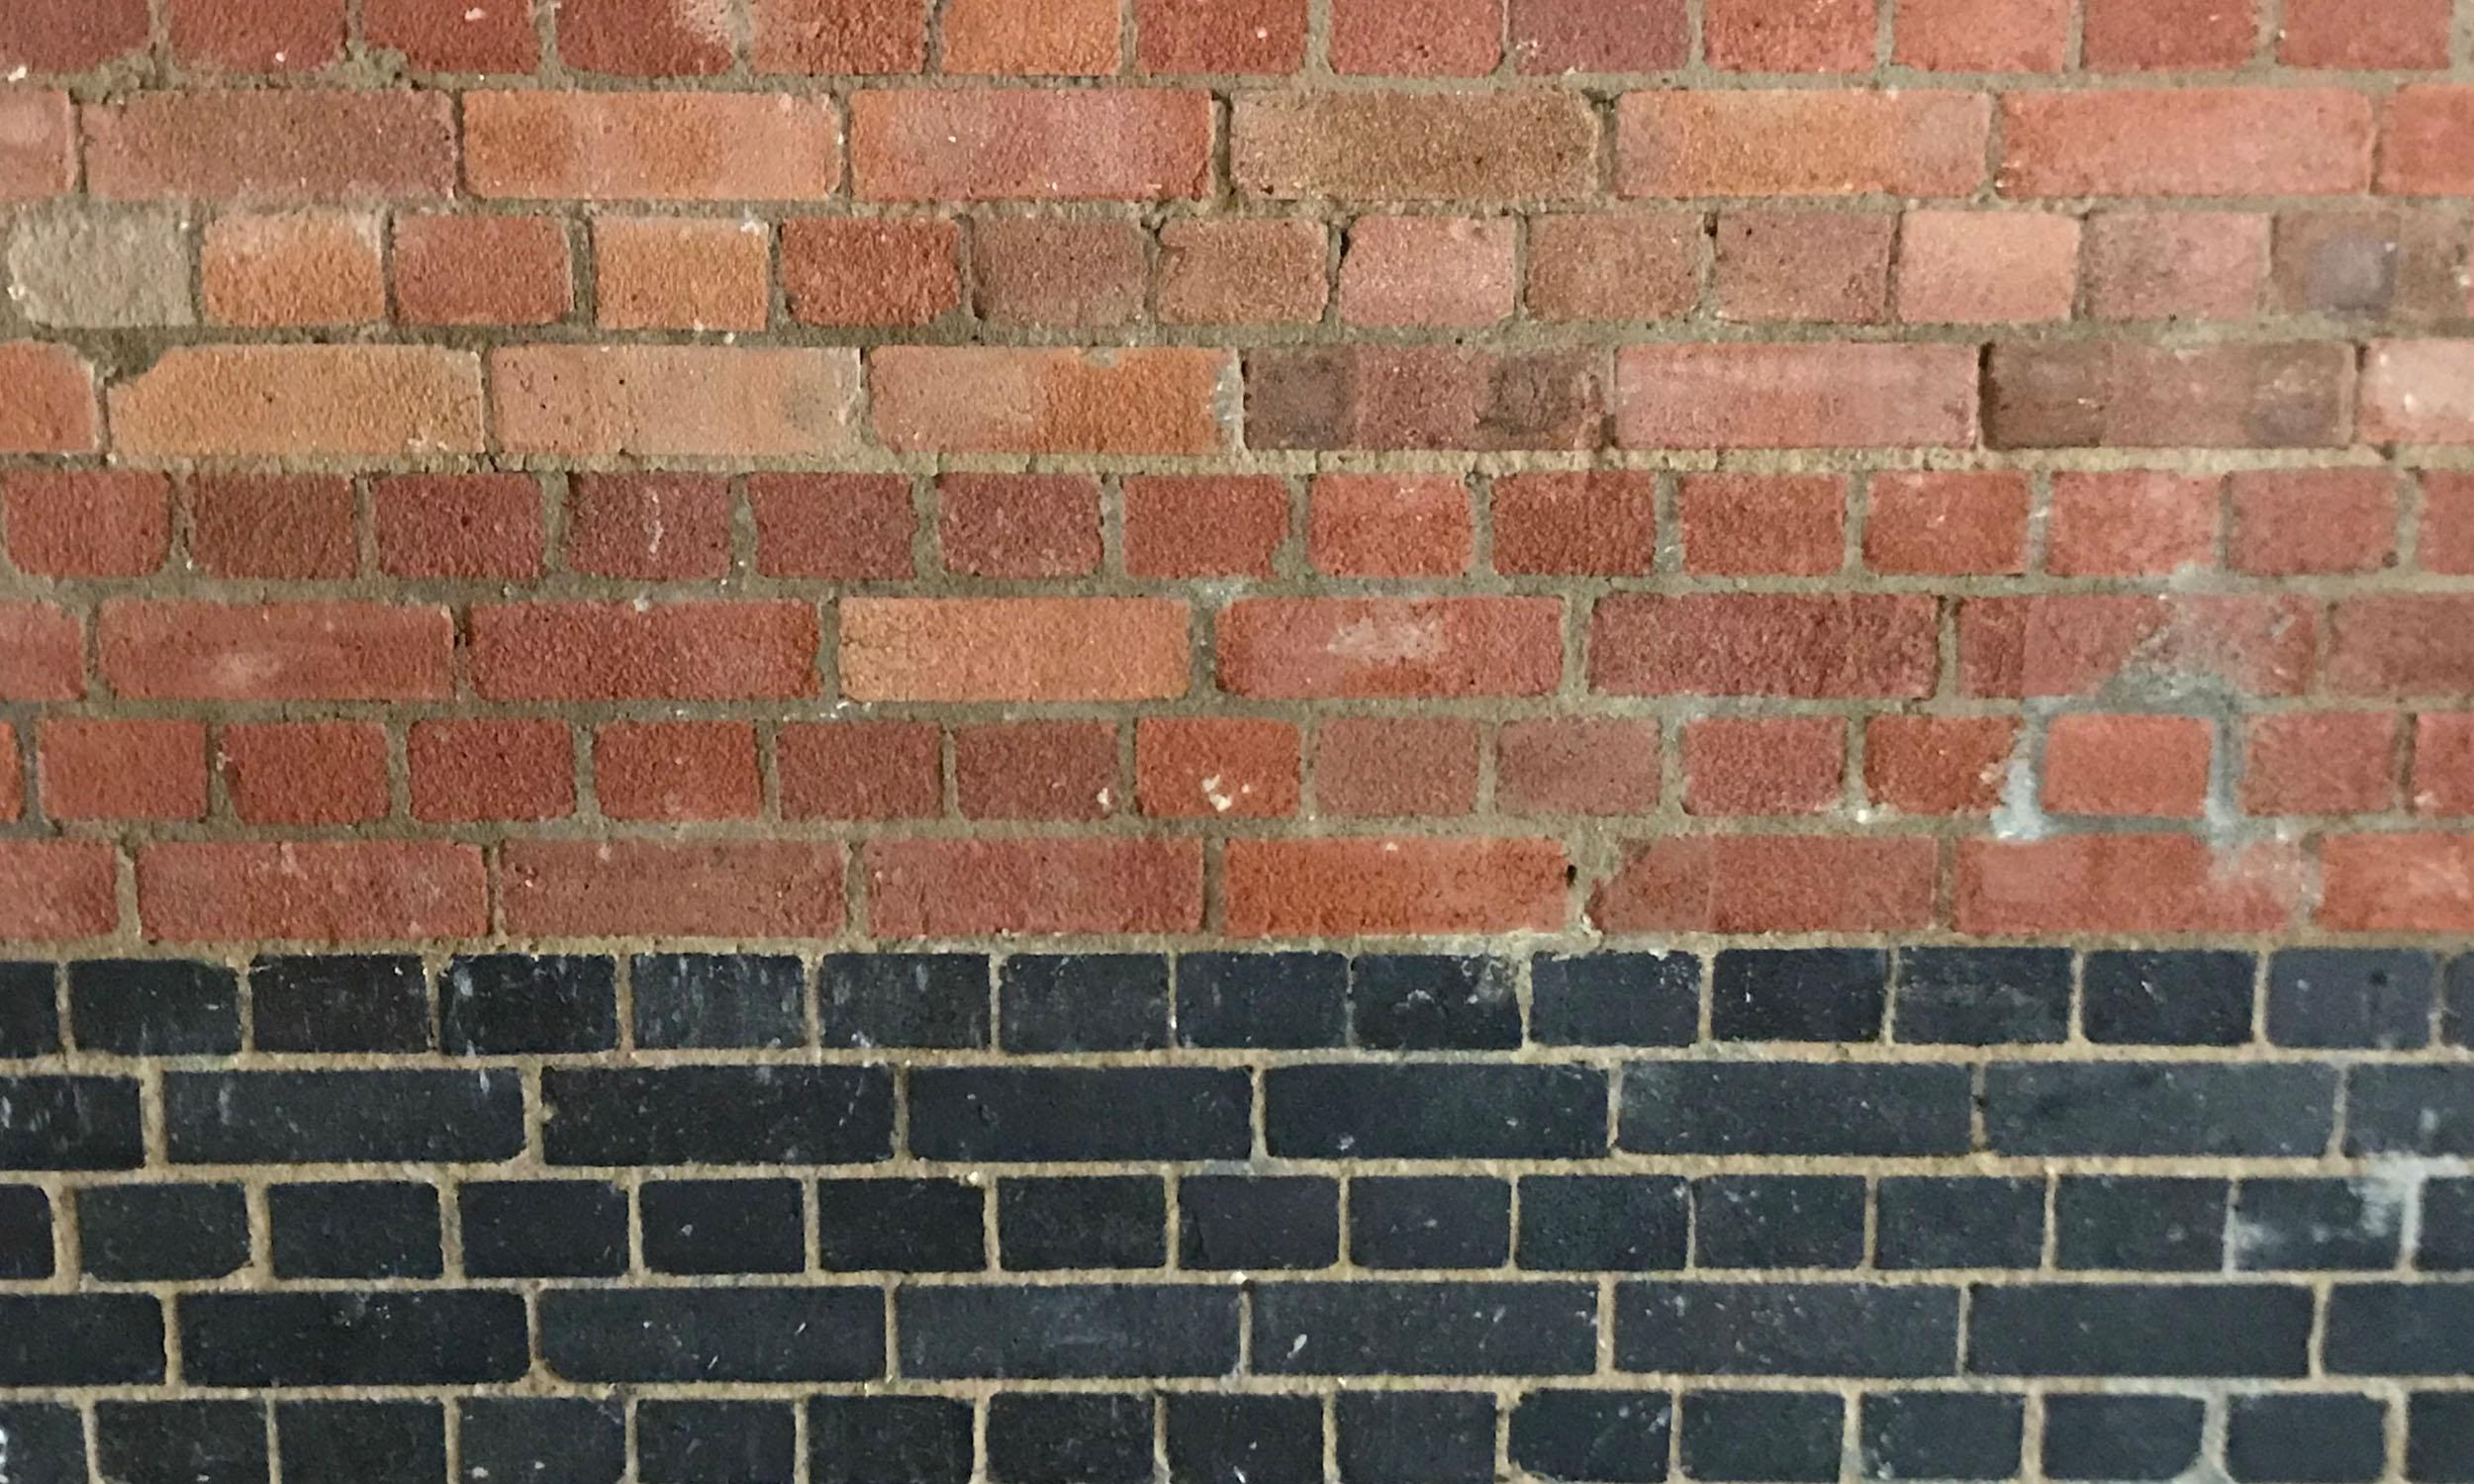 Brick photos – courtesy of London |Liz's Brick notebook – courtesy of @sherwoodforlee, @quirkbooks